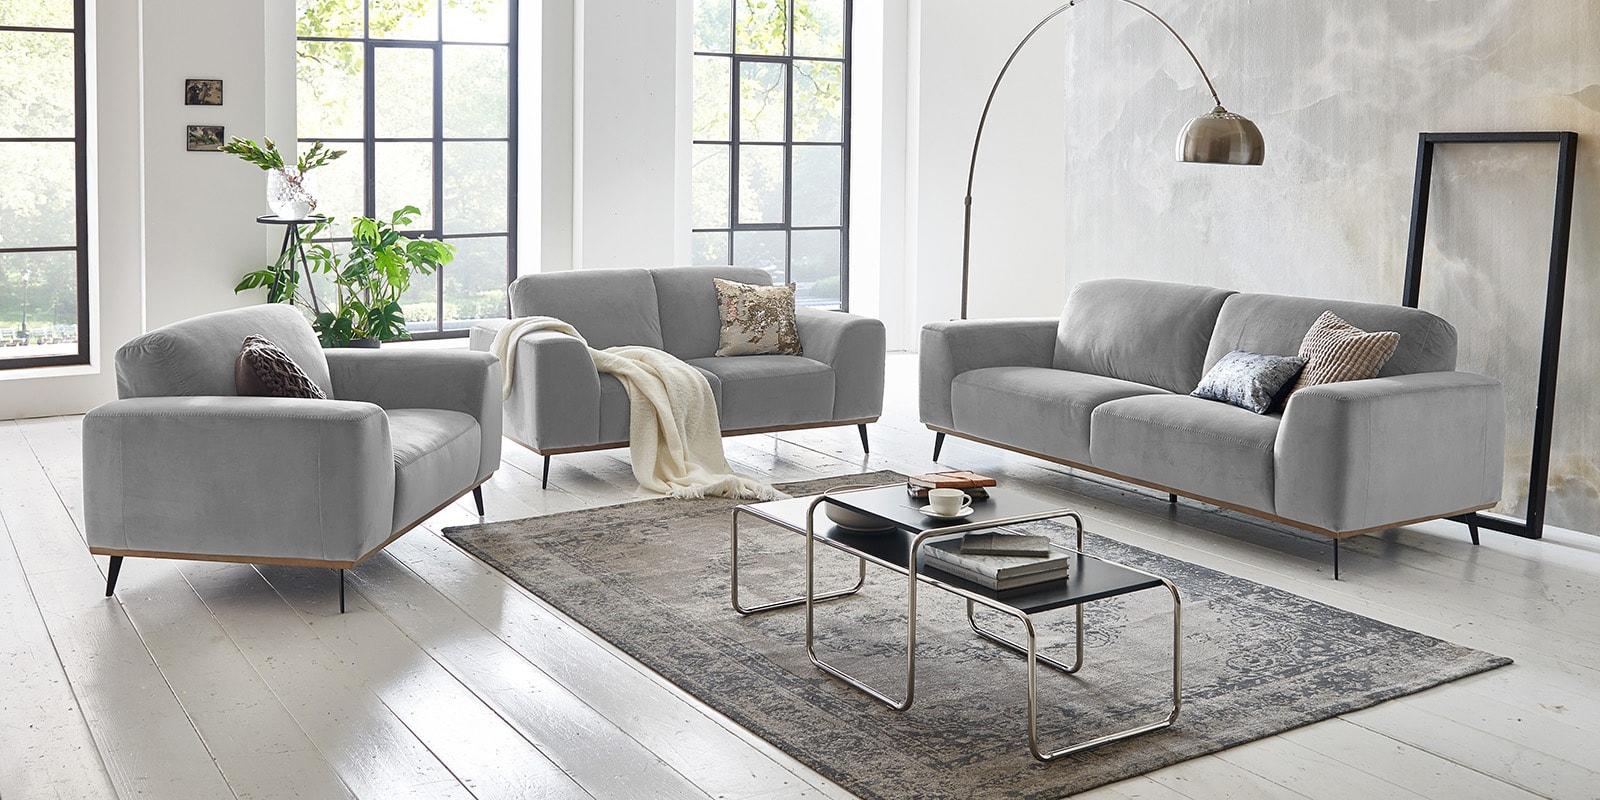 Full Size of Couchgarnitur 3 2 1 Sitzer Chesterfield Sofa Emma Samt Big Emma 3 2 1 Sitzer Superior Skandinavisches Design Couch Grau Samtstoff Muuto Big Mit Hocker Home Sofa Sofa 3 2 1 Sitzer